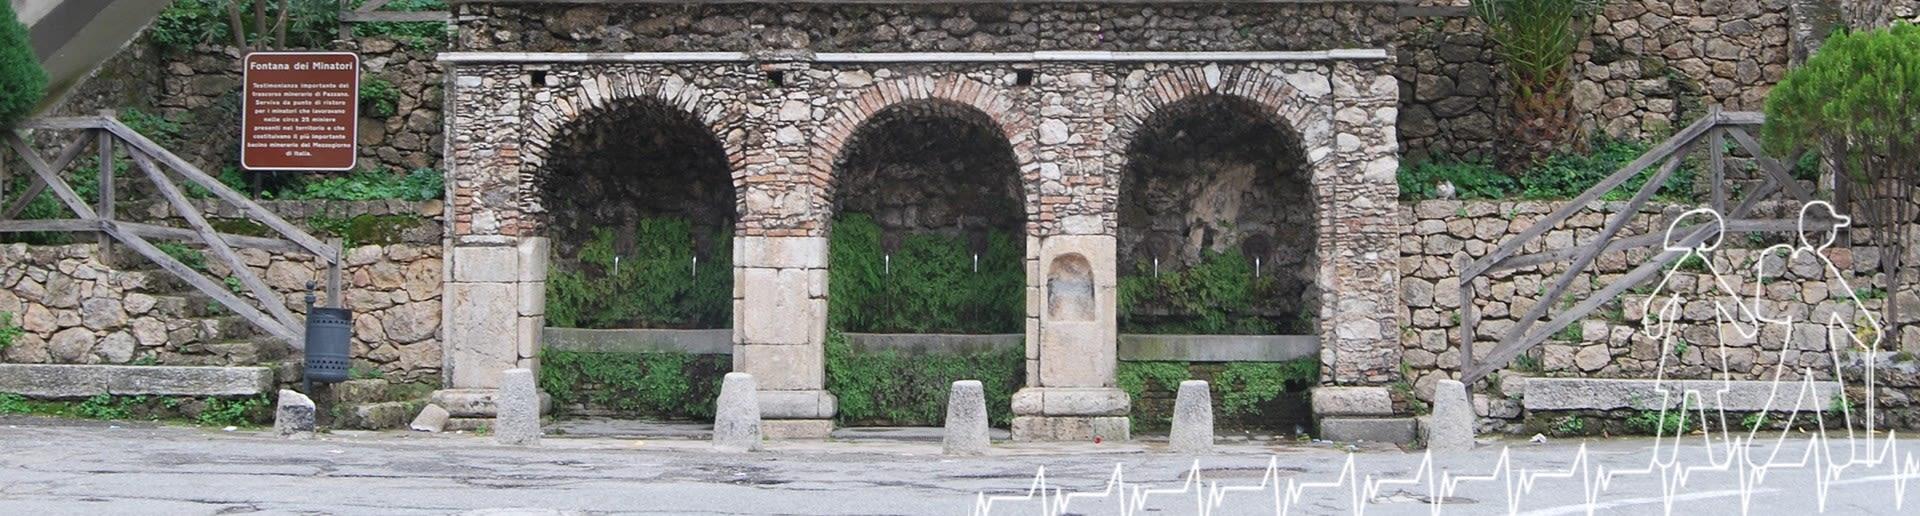 Pazzano; Fontana dei Minatori (Fontana Vecchia)